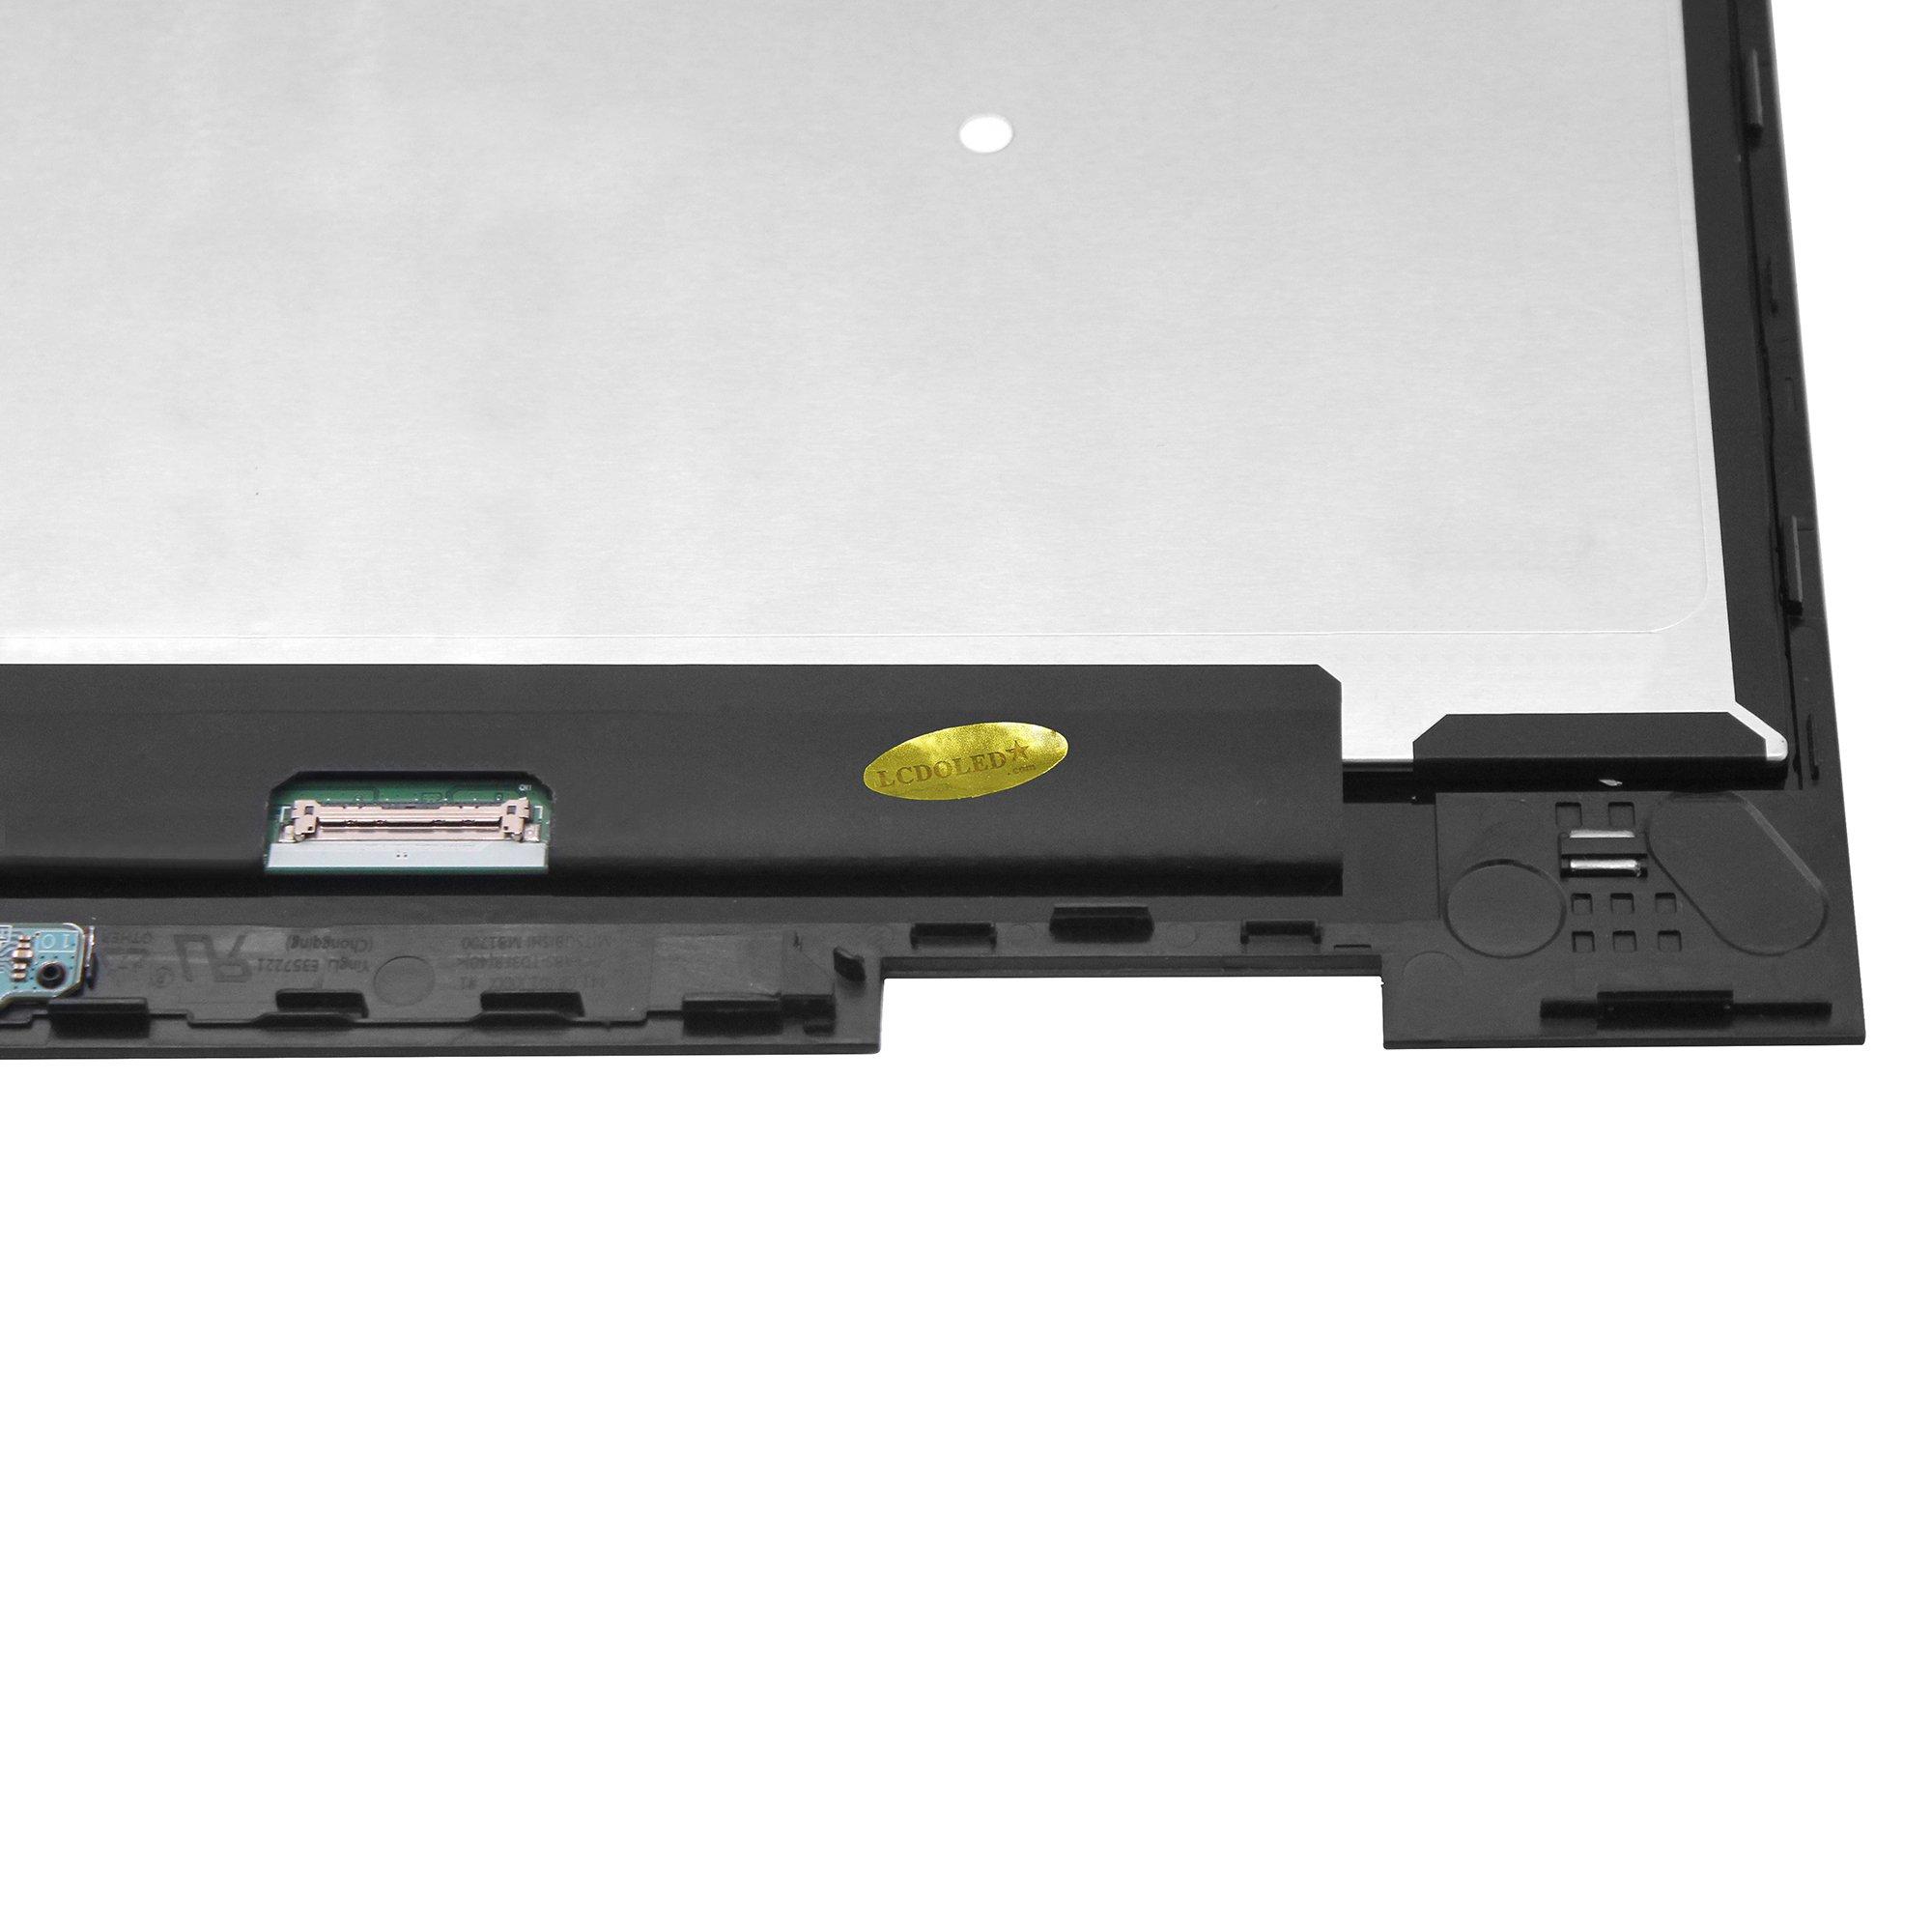 LCDOLED 15.6'' FullHD IPS LCD Touch Screen Digitizer Assembly + Bezel + Board for HP Envy x360 15-bq 15-bq000 15-bq100 15m-bq000 15m-bq100 15m-bq021dx 15m-bq121dx 15-bq175nr 15-bq075nr 15-bq051nr by LCDOLED (Image #5)